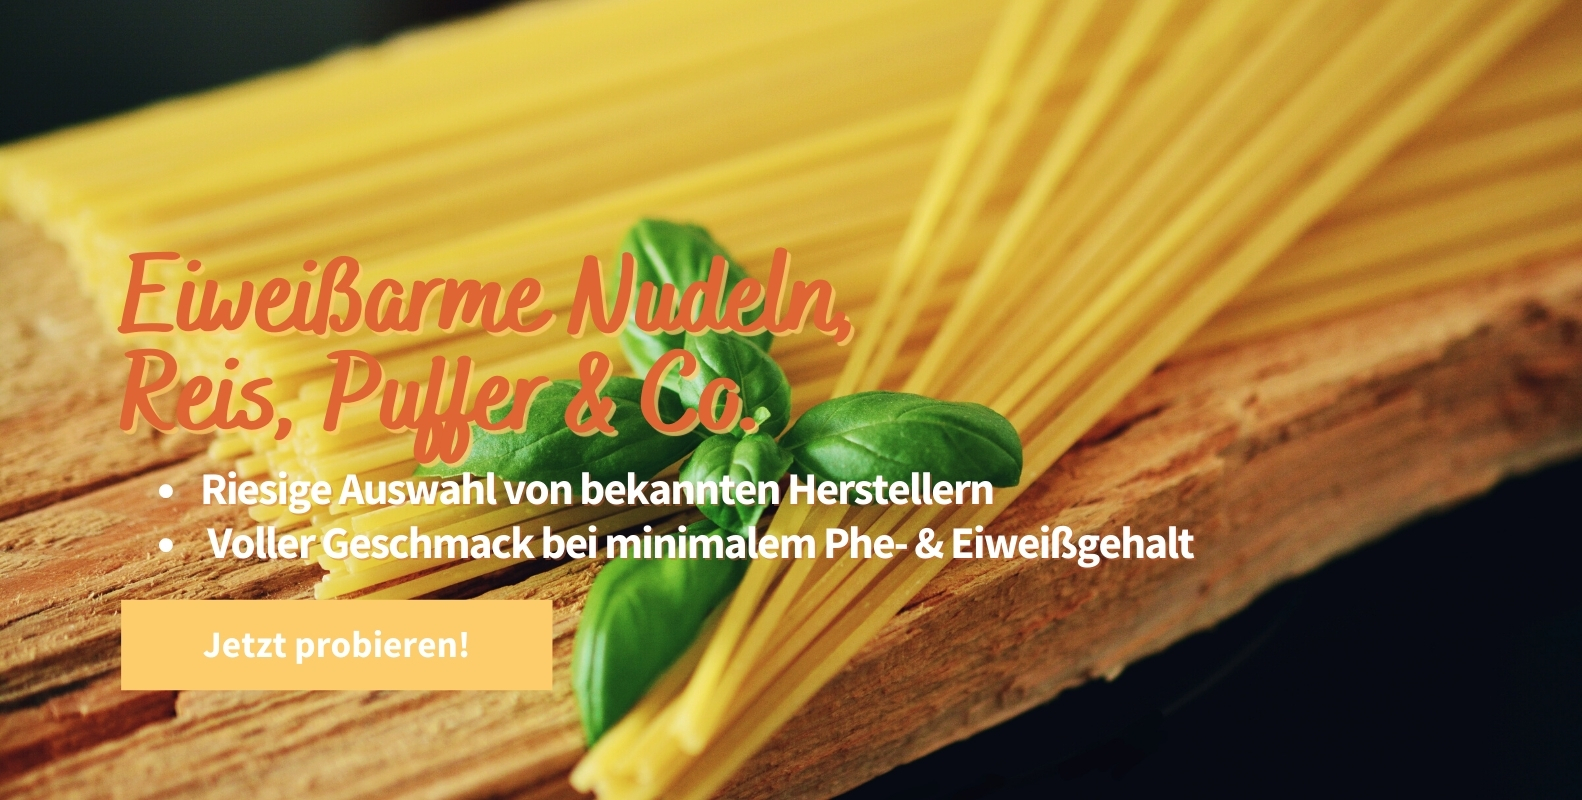 Eiweißarme Nudeln, Reis, Puffer & Co. - Eiweißarme Lebensmittel kaufen